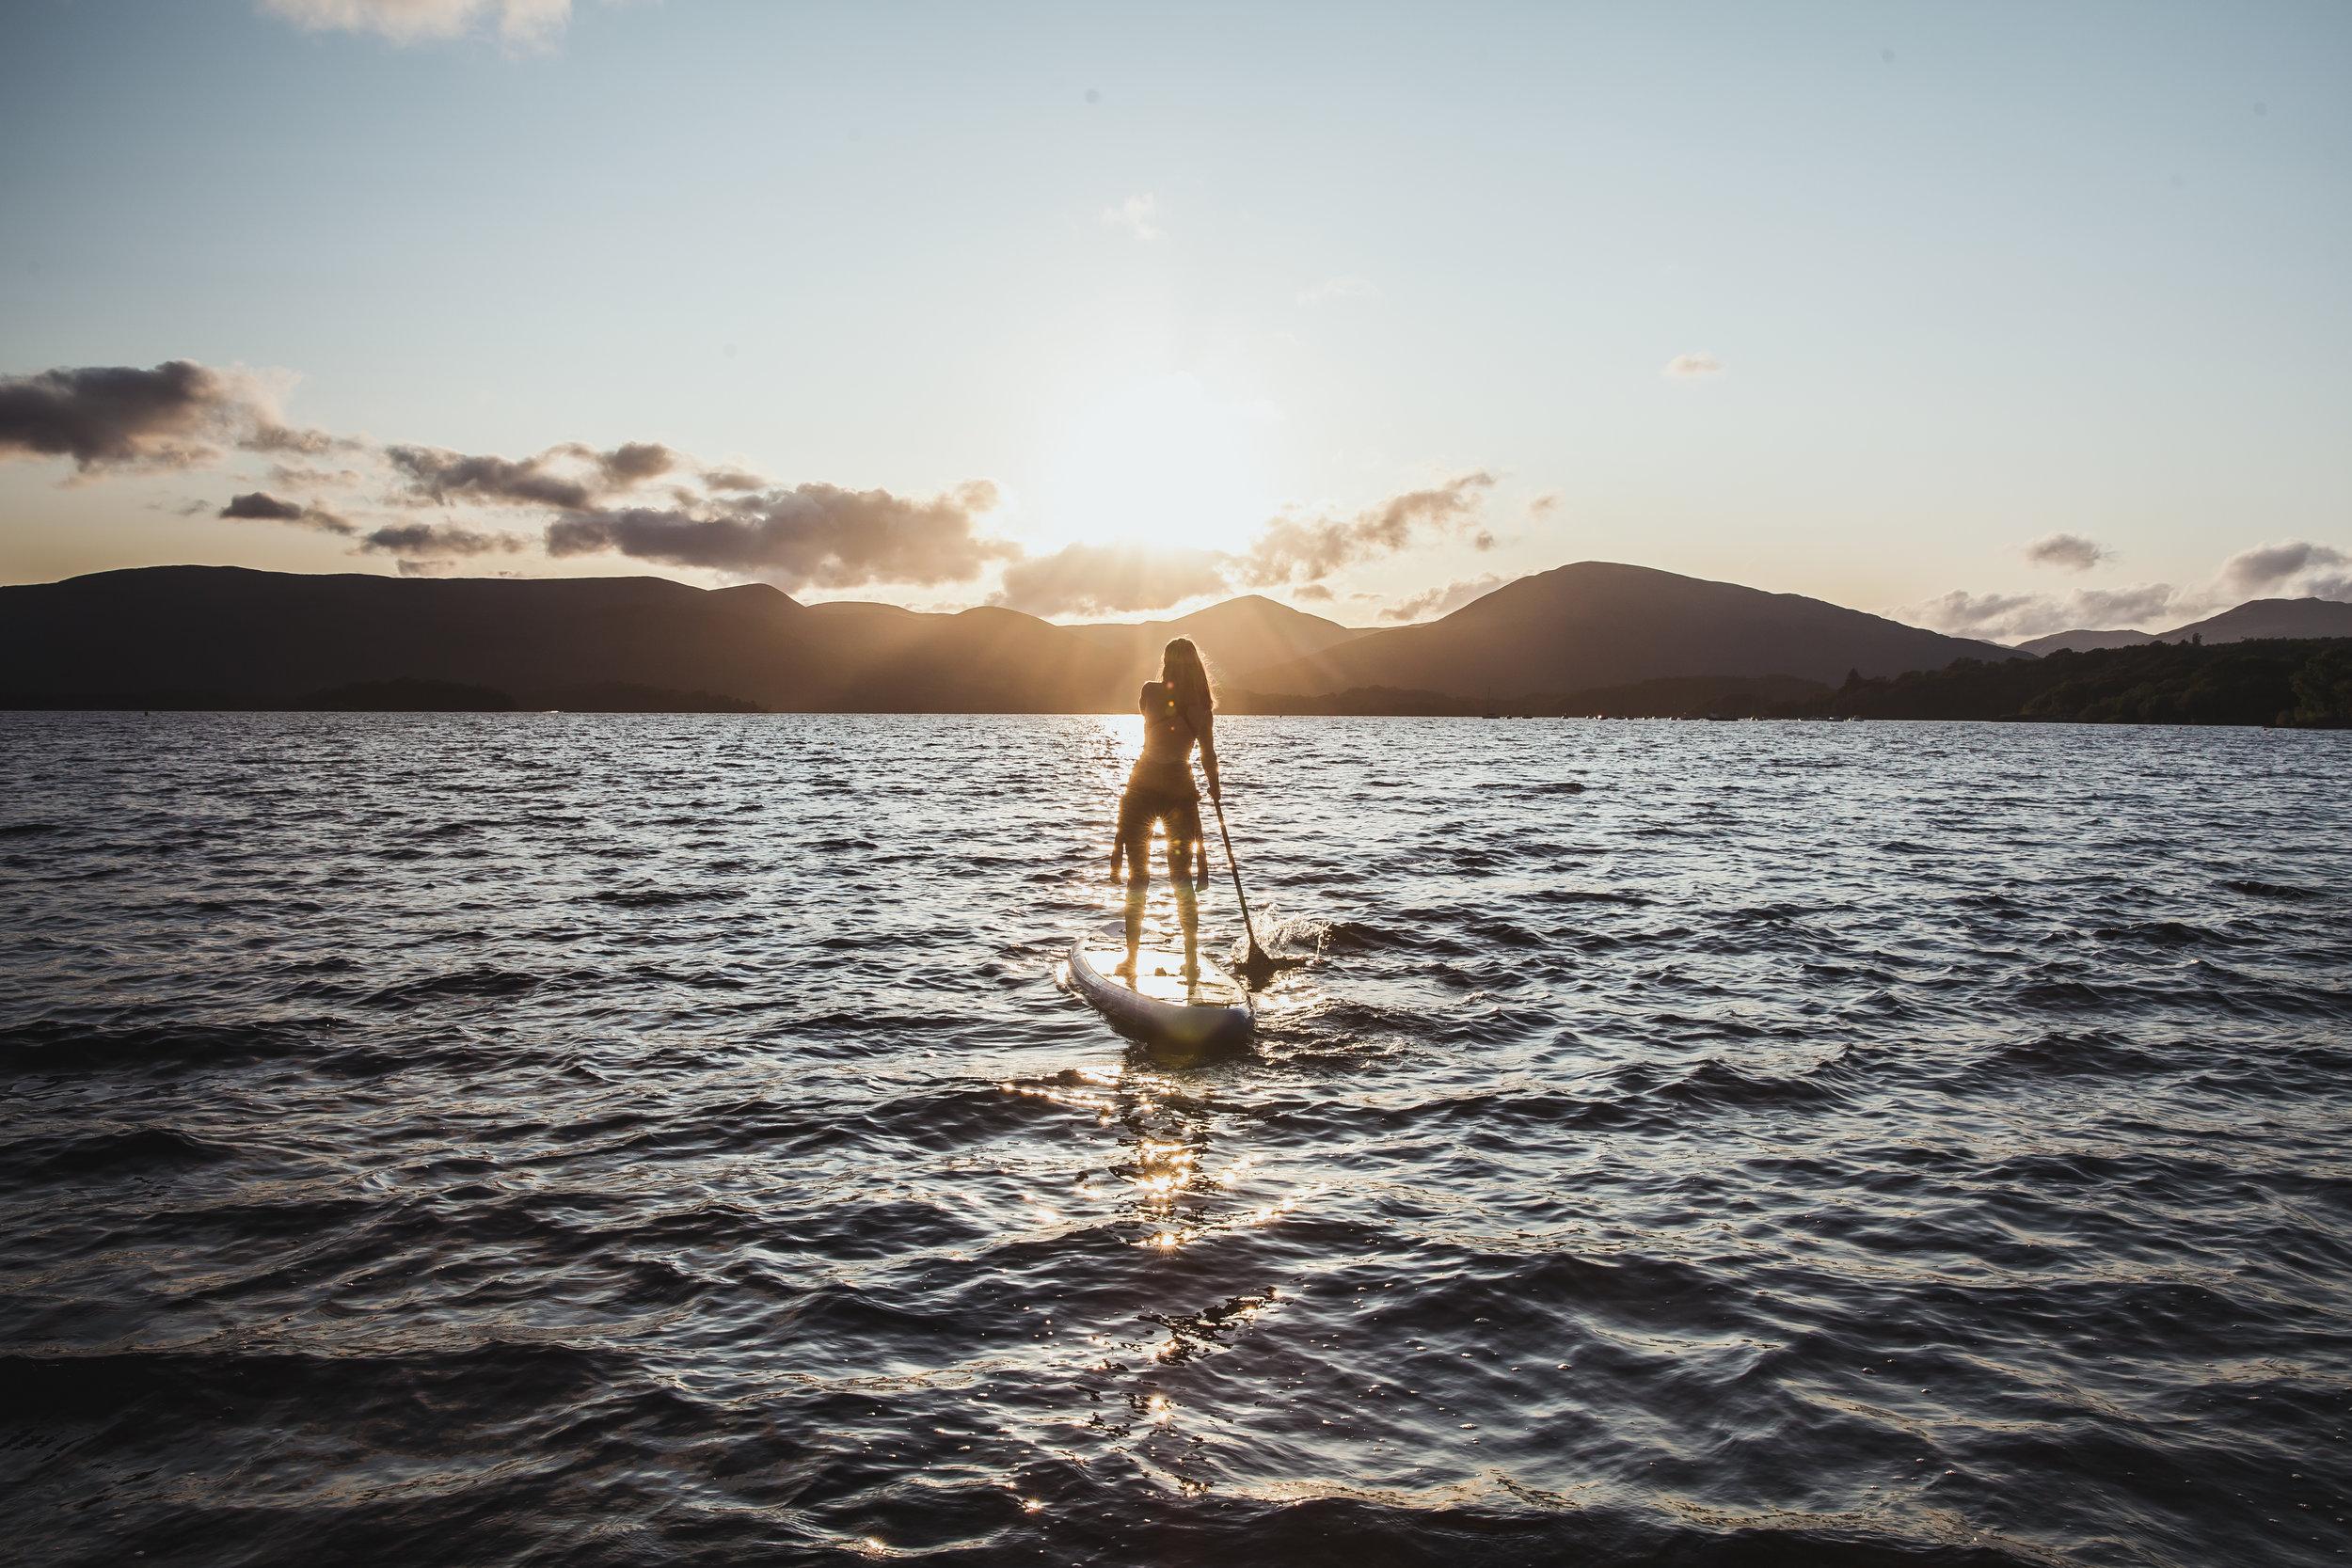 emily-hutton-paddle-boarding-scotland